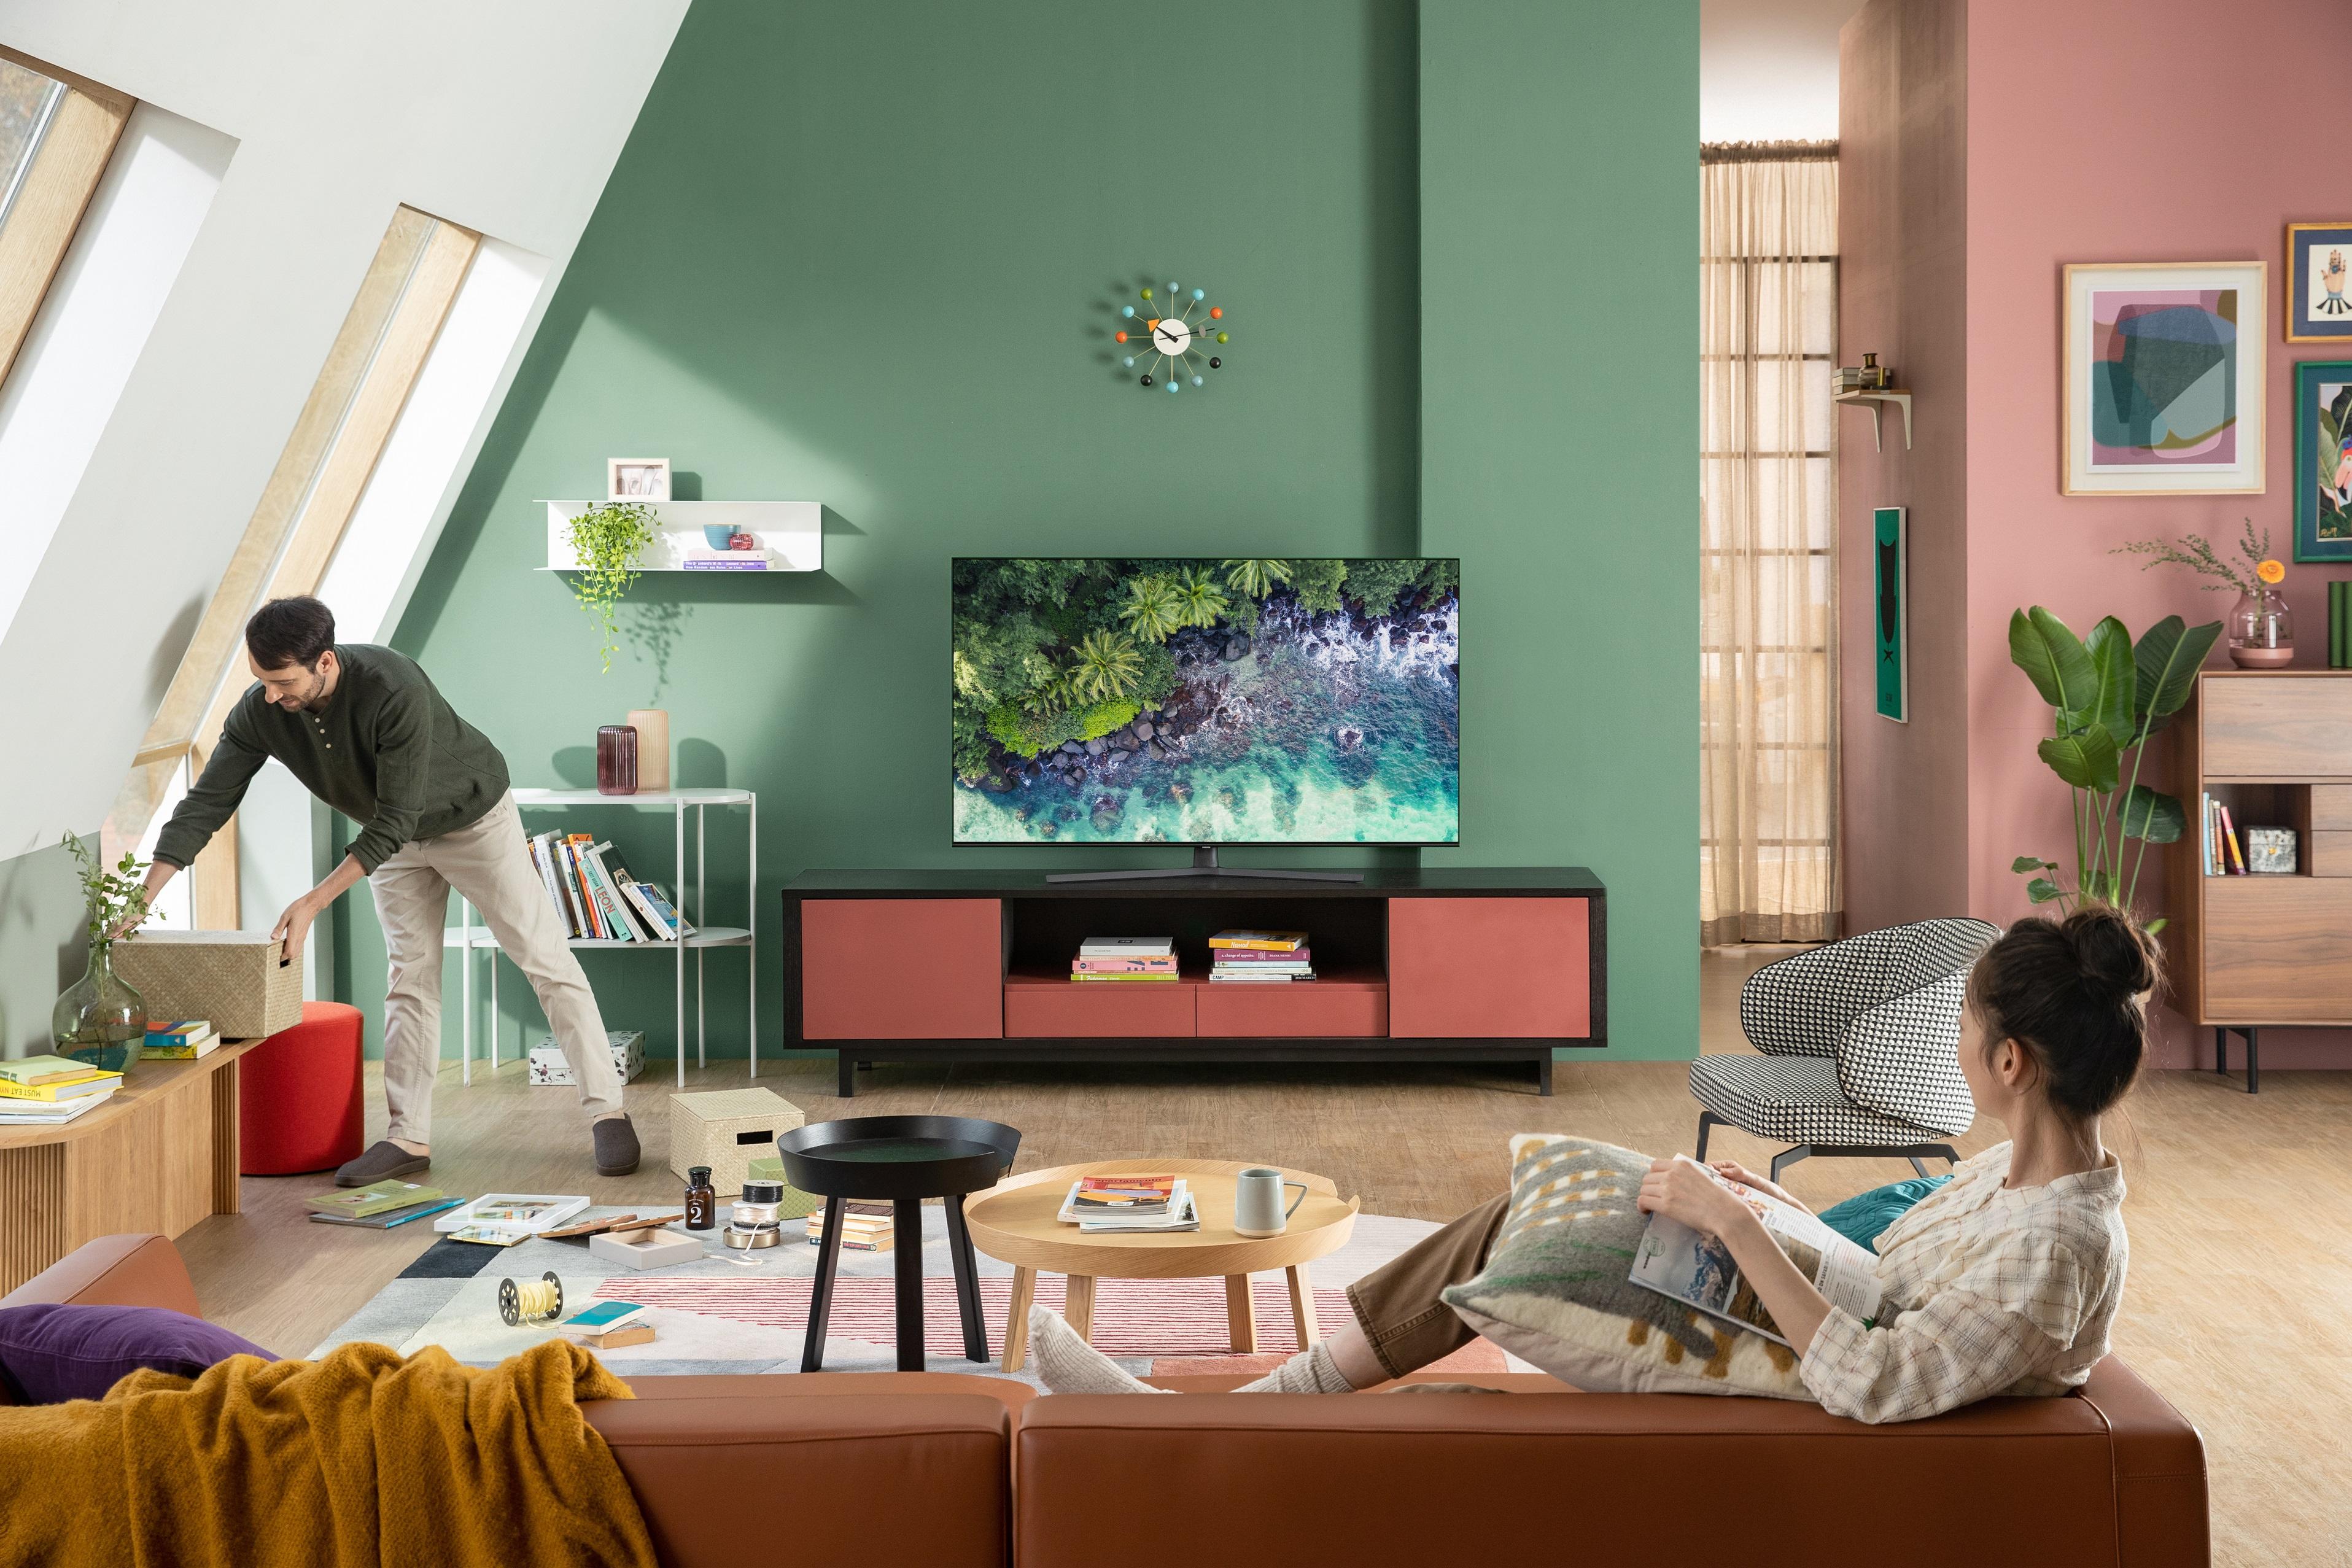 Samsung gioi thieu TV QLED 4K 2020 tai Viet Nam, gia tu 11,9 trieu hinh anh 2 TU8500_2_rz.jpg